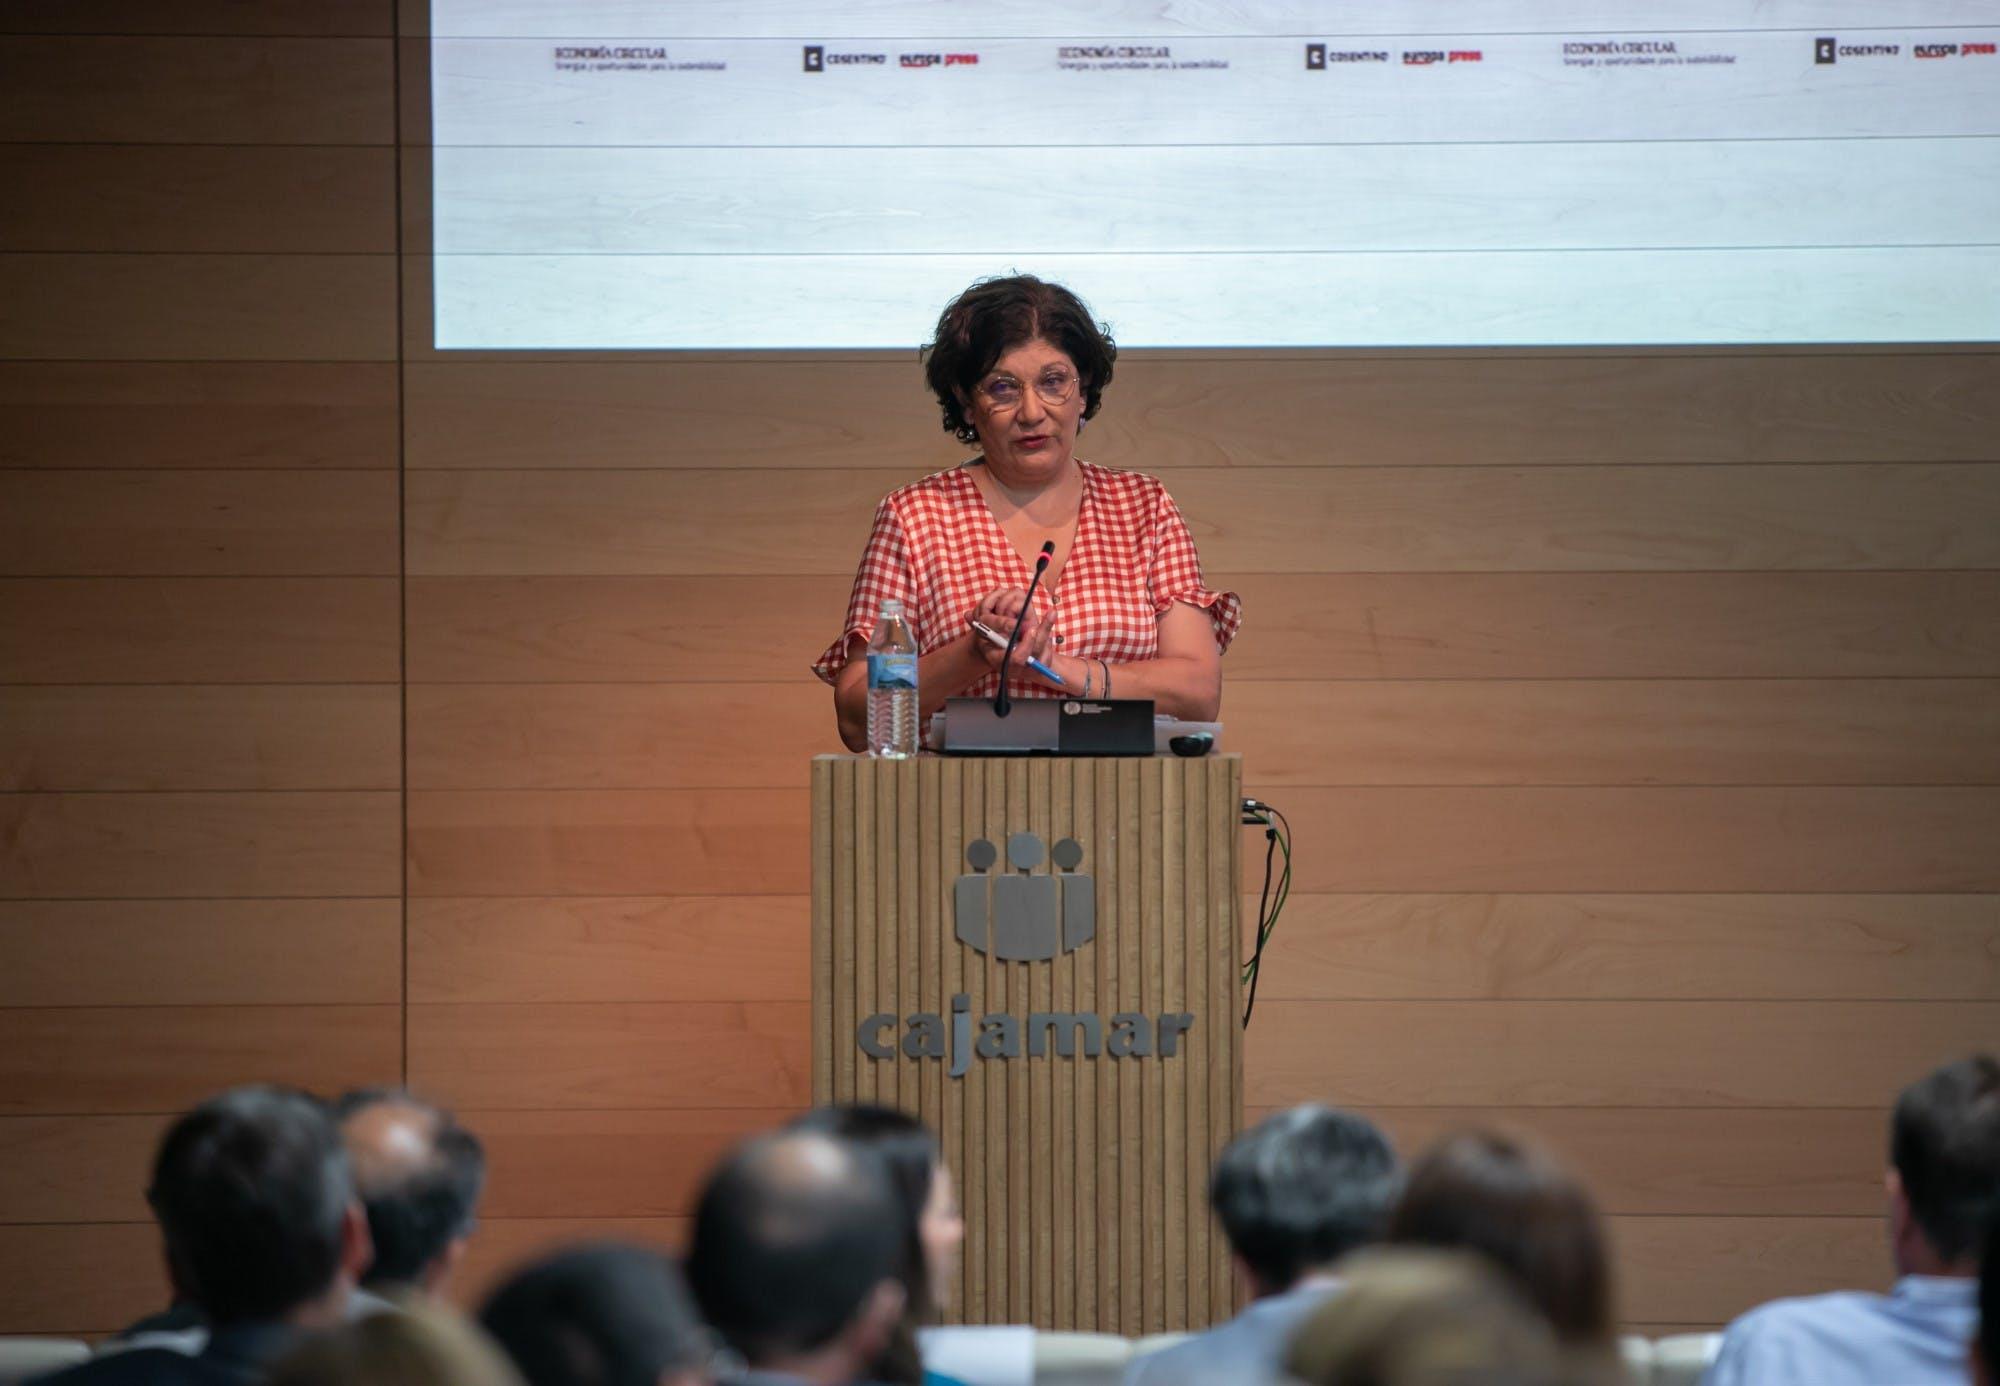 Image of Susana Magro Jornada Economia Circular Cosentino 2 in Cosentino promotes the Circular Economy and Industrial Simbiosis - Cosentino